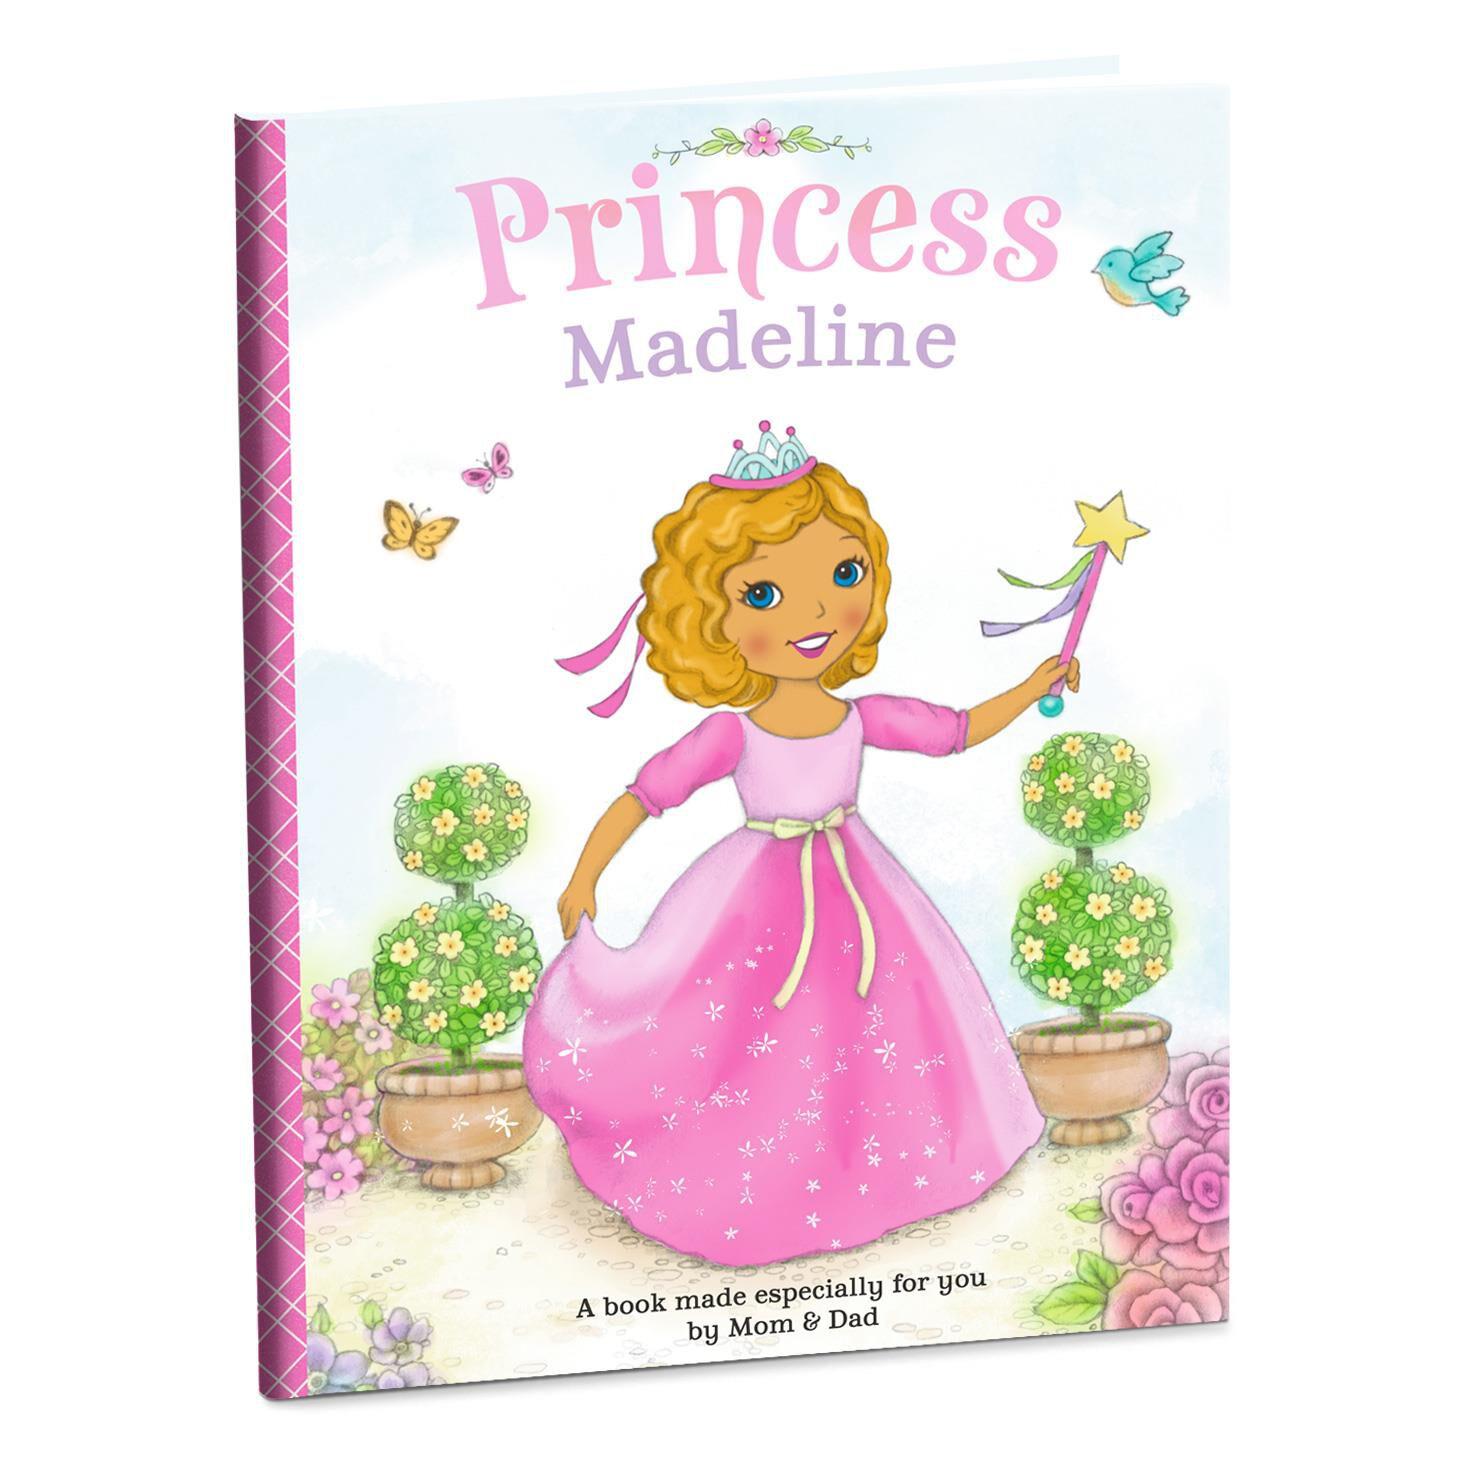 Princess Personalized Book - Personalized Books - Hallmark